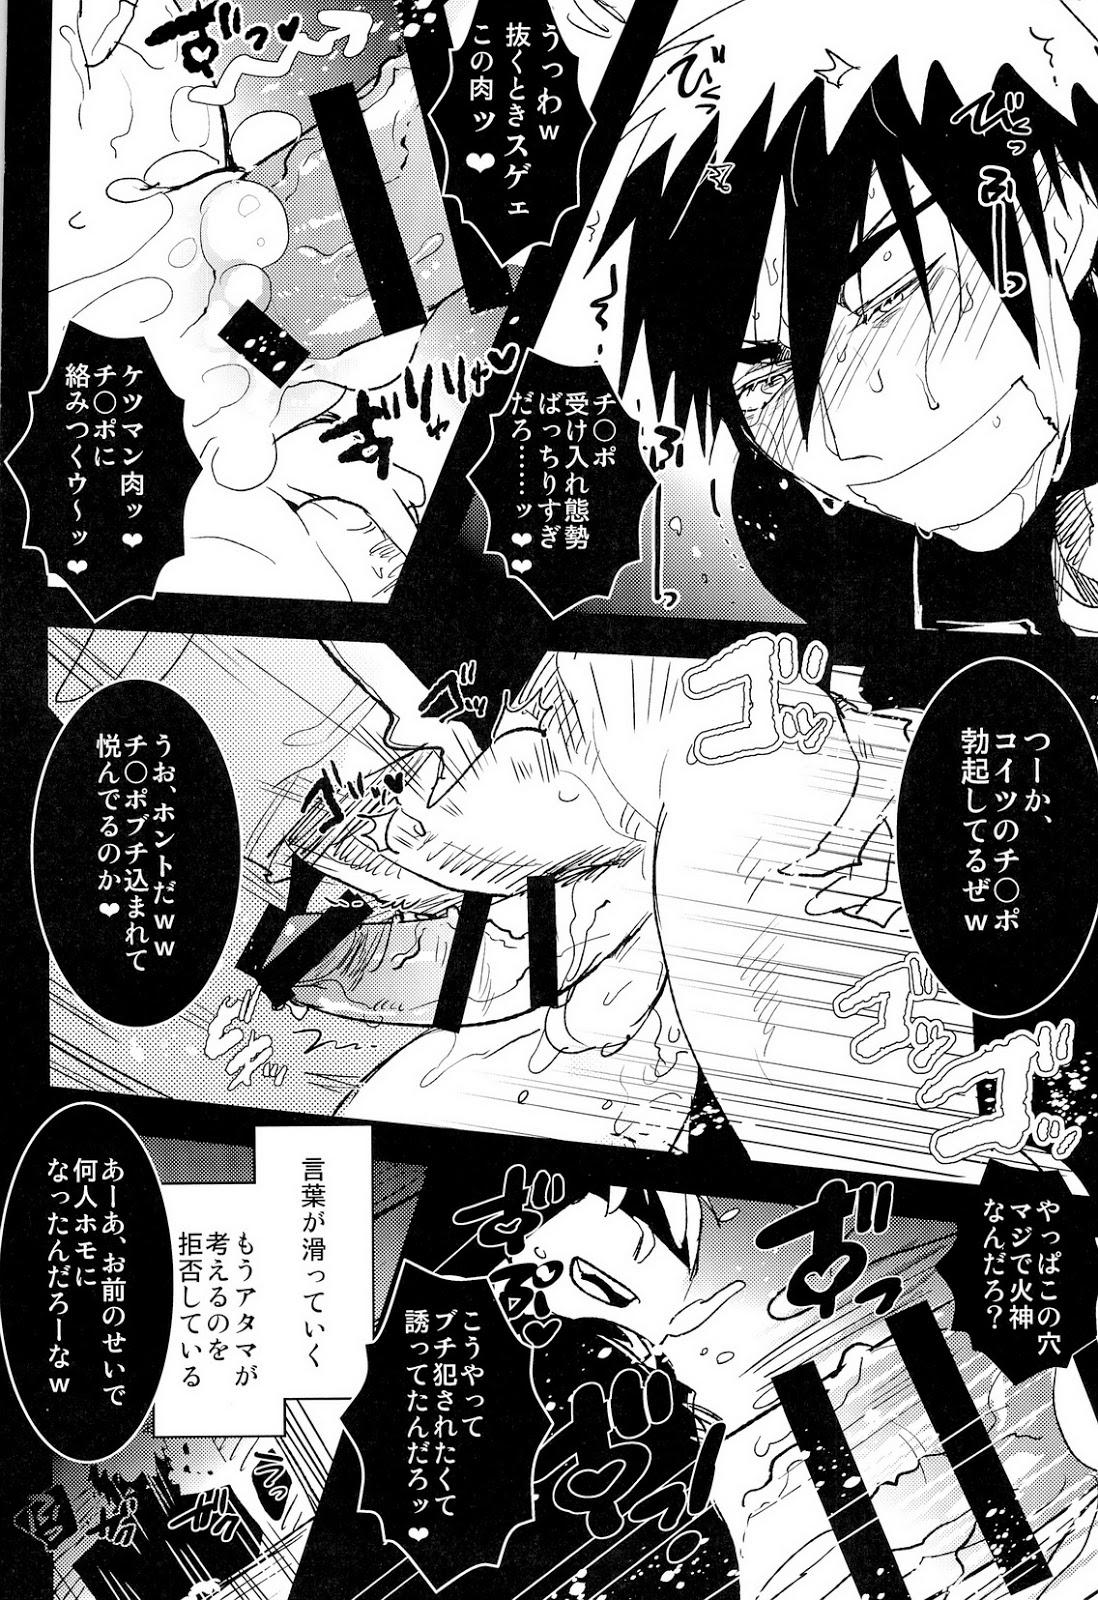 Kabejiri Hon - DK Fuck 17